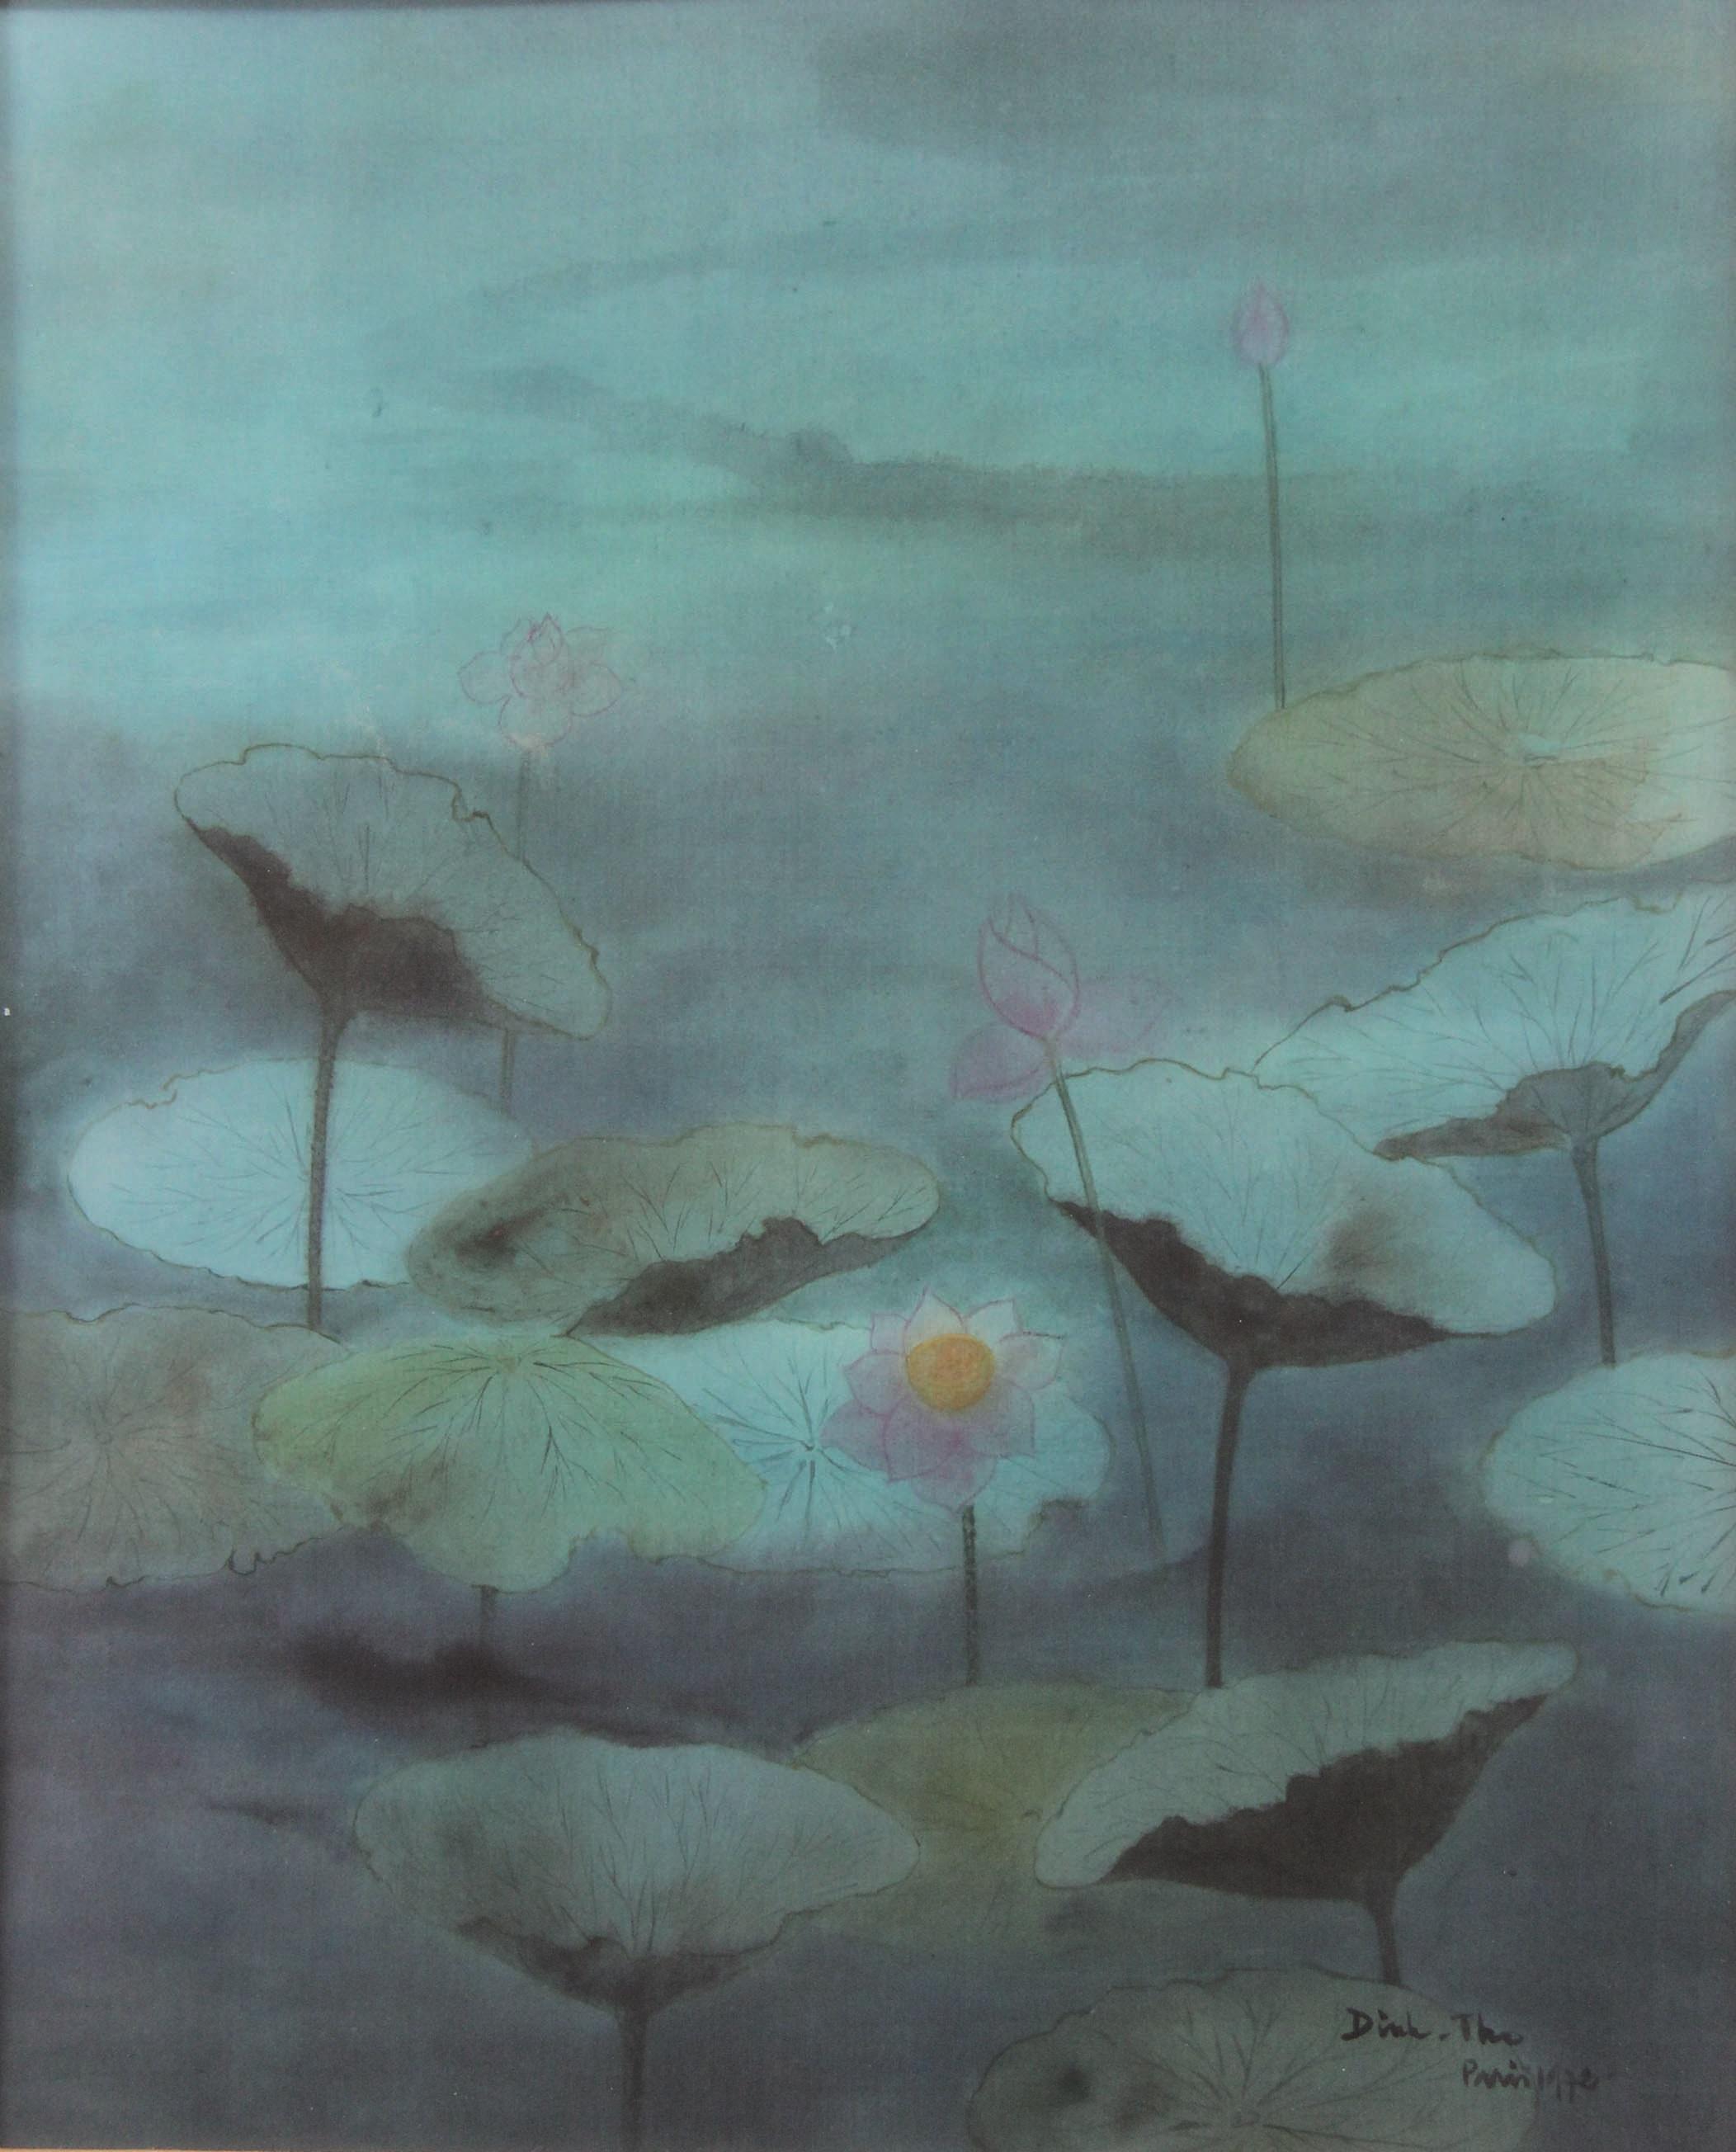 Dinh THO (1931-) Les nymphéas